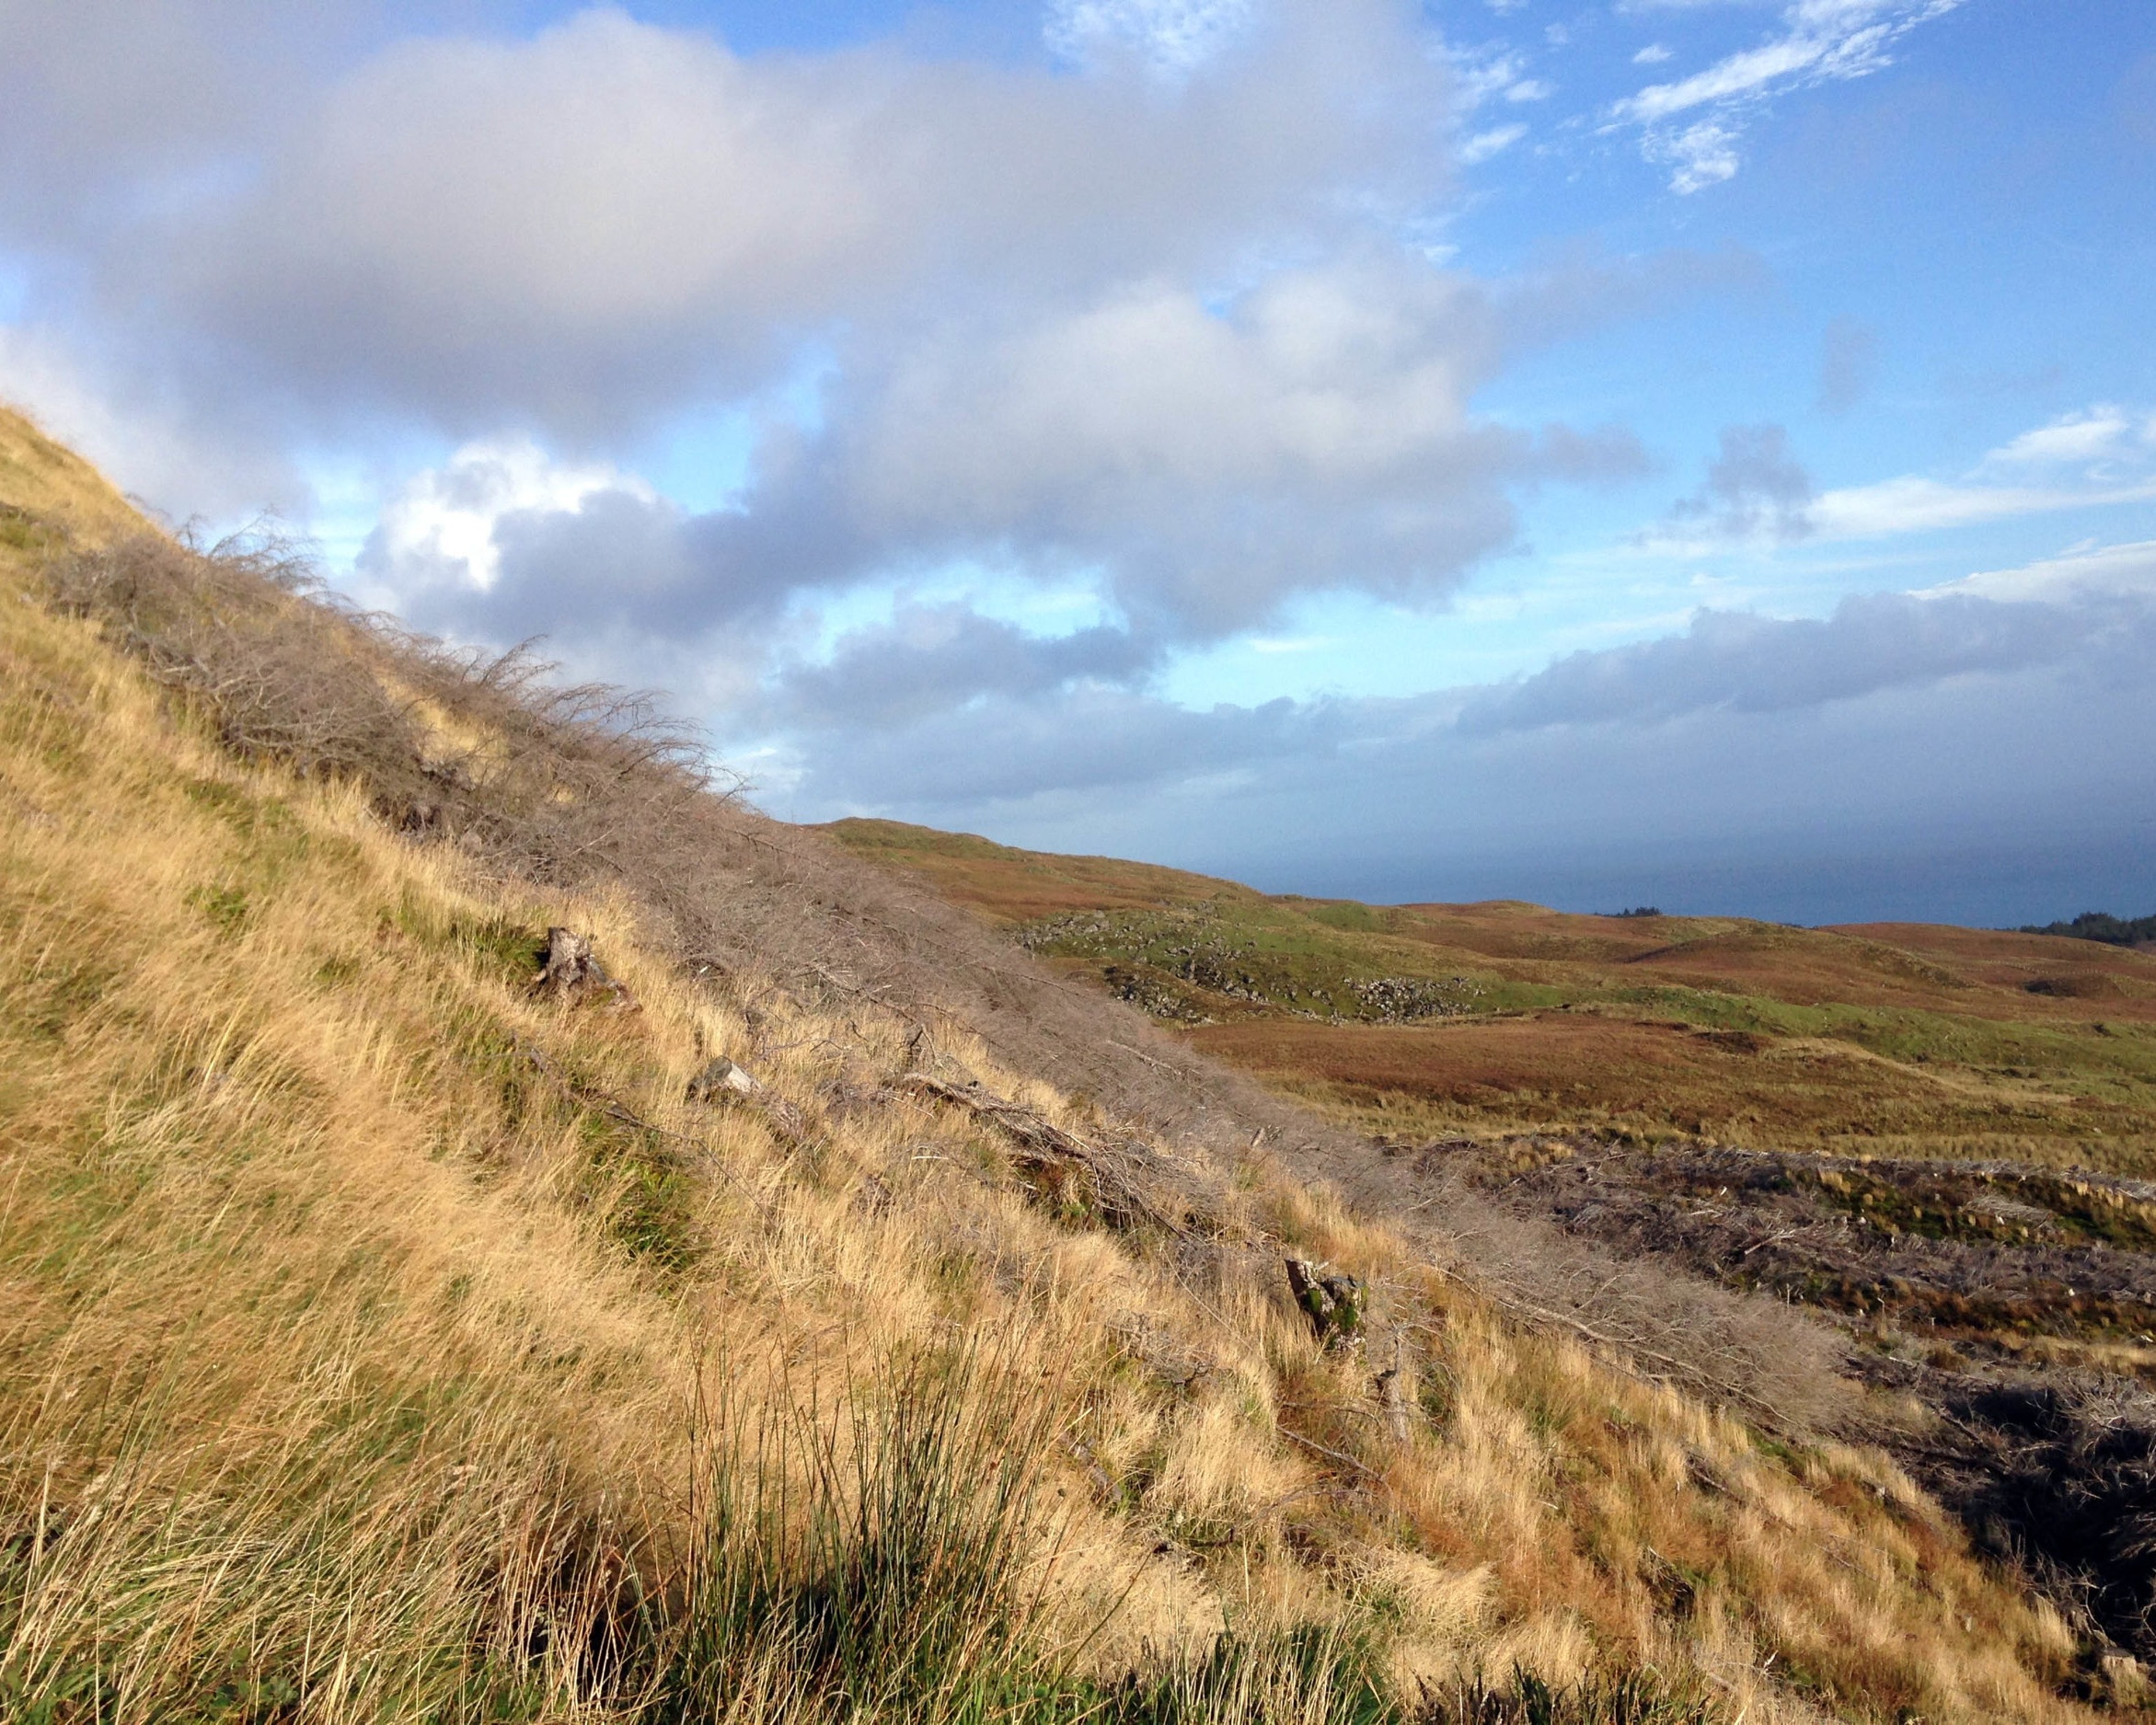 Thew views on my epic trek though in the Isle of Skye, Scotland